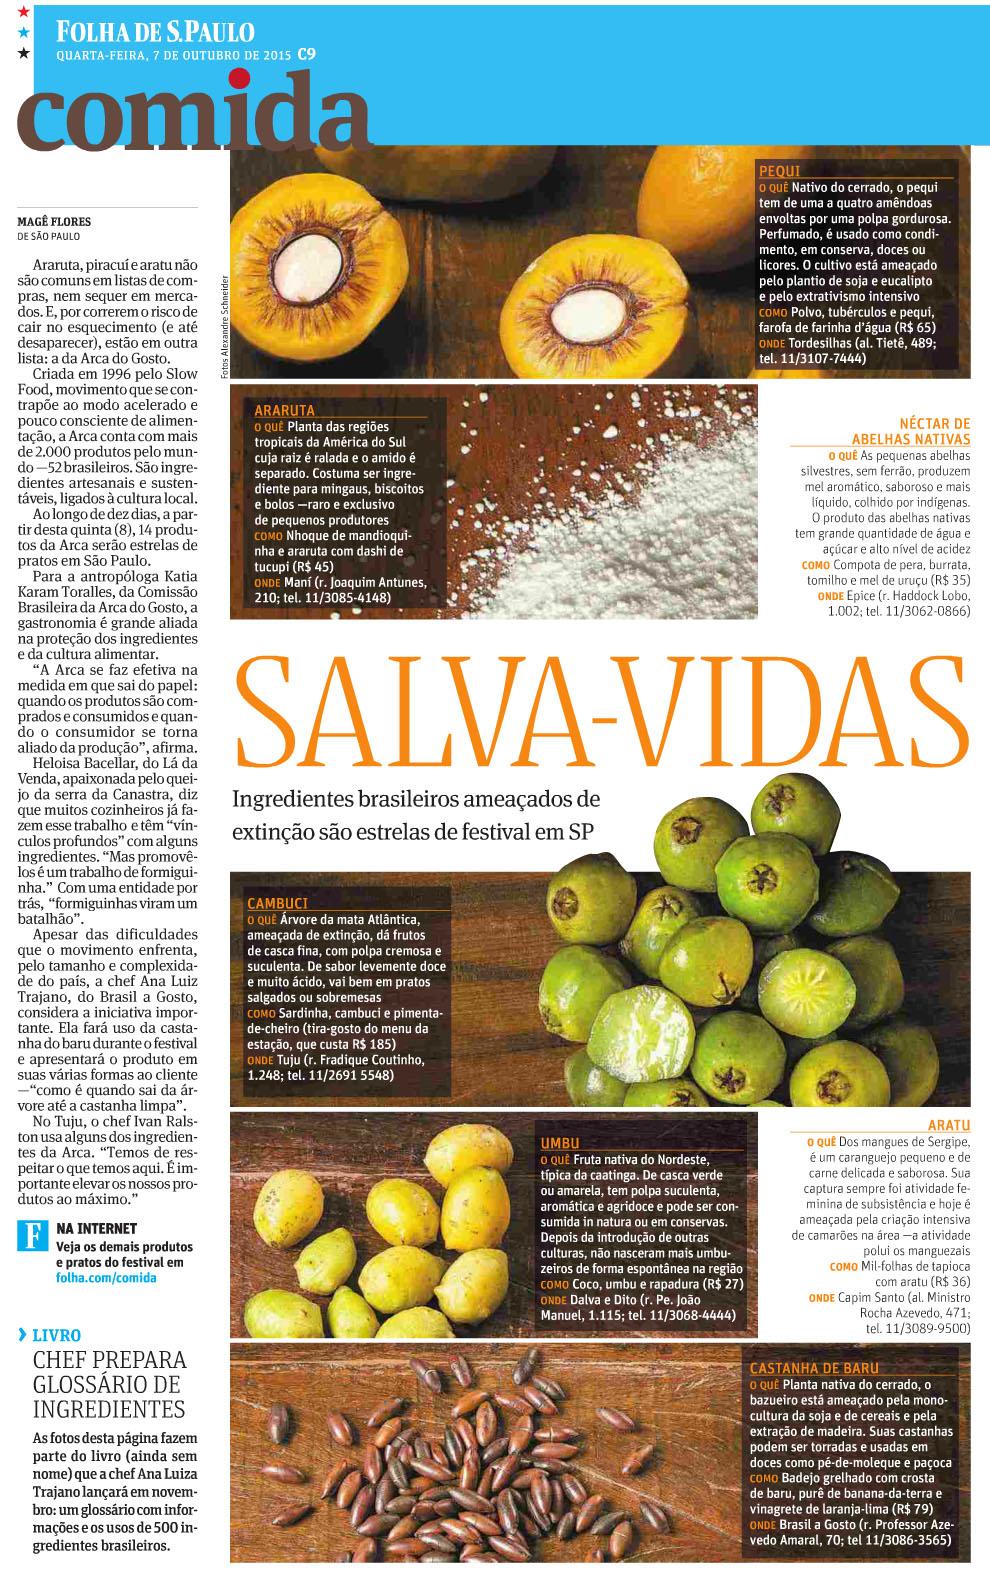 Folha Comida - Slow Food